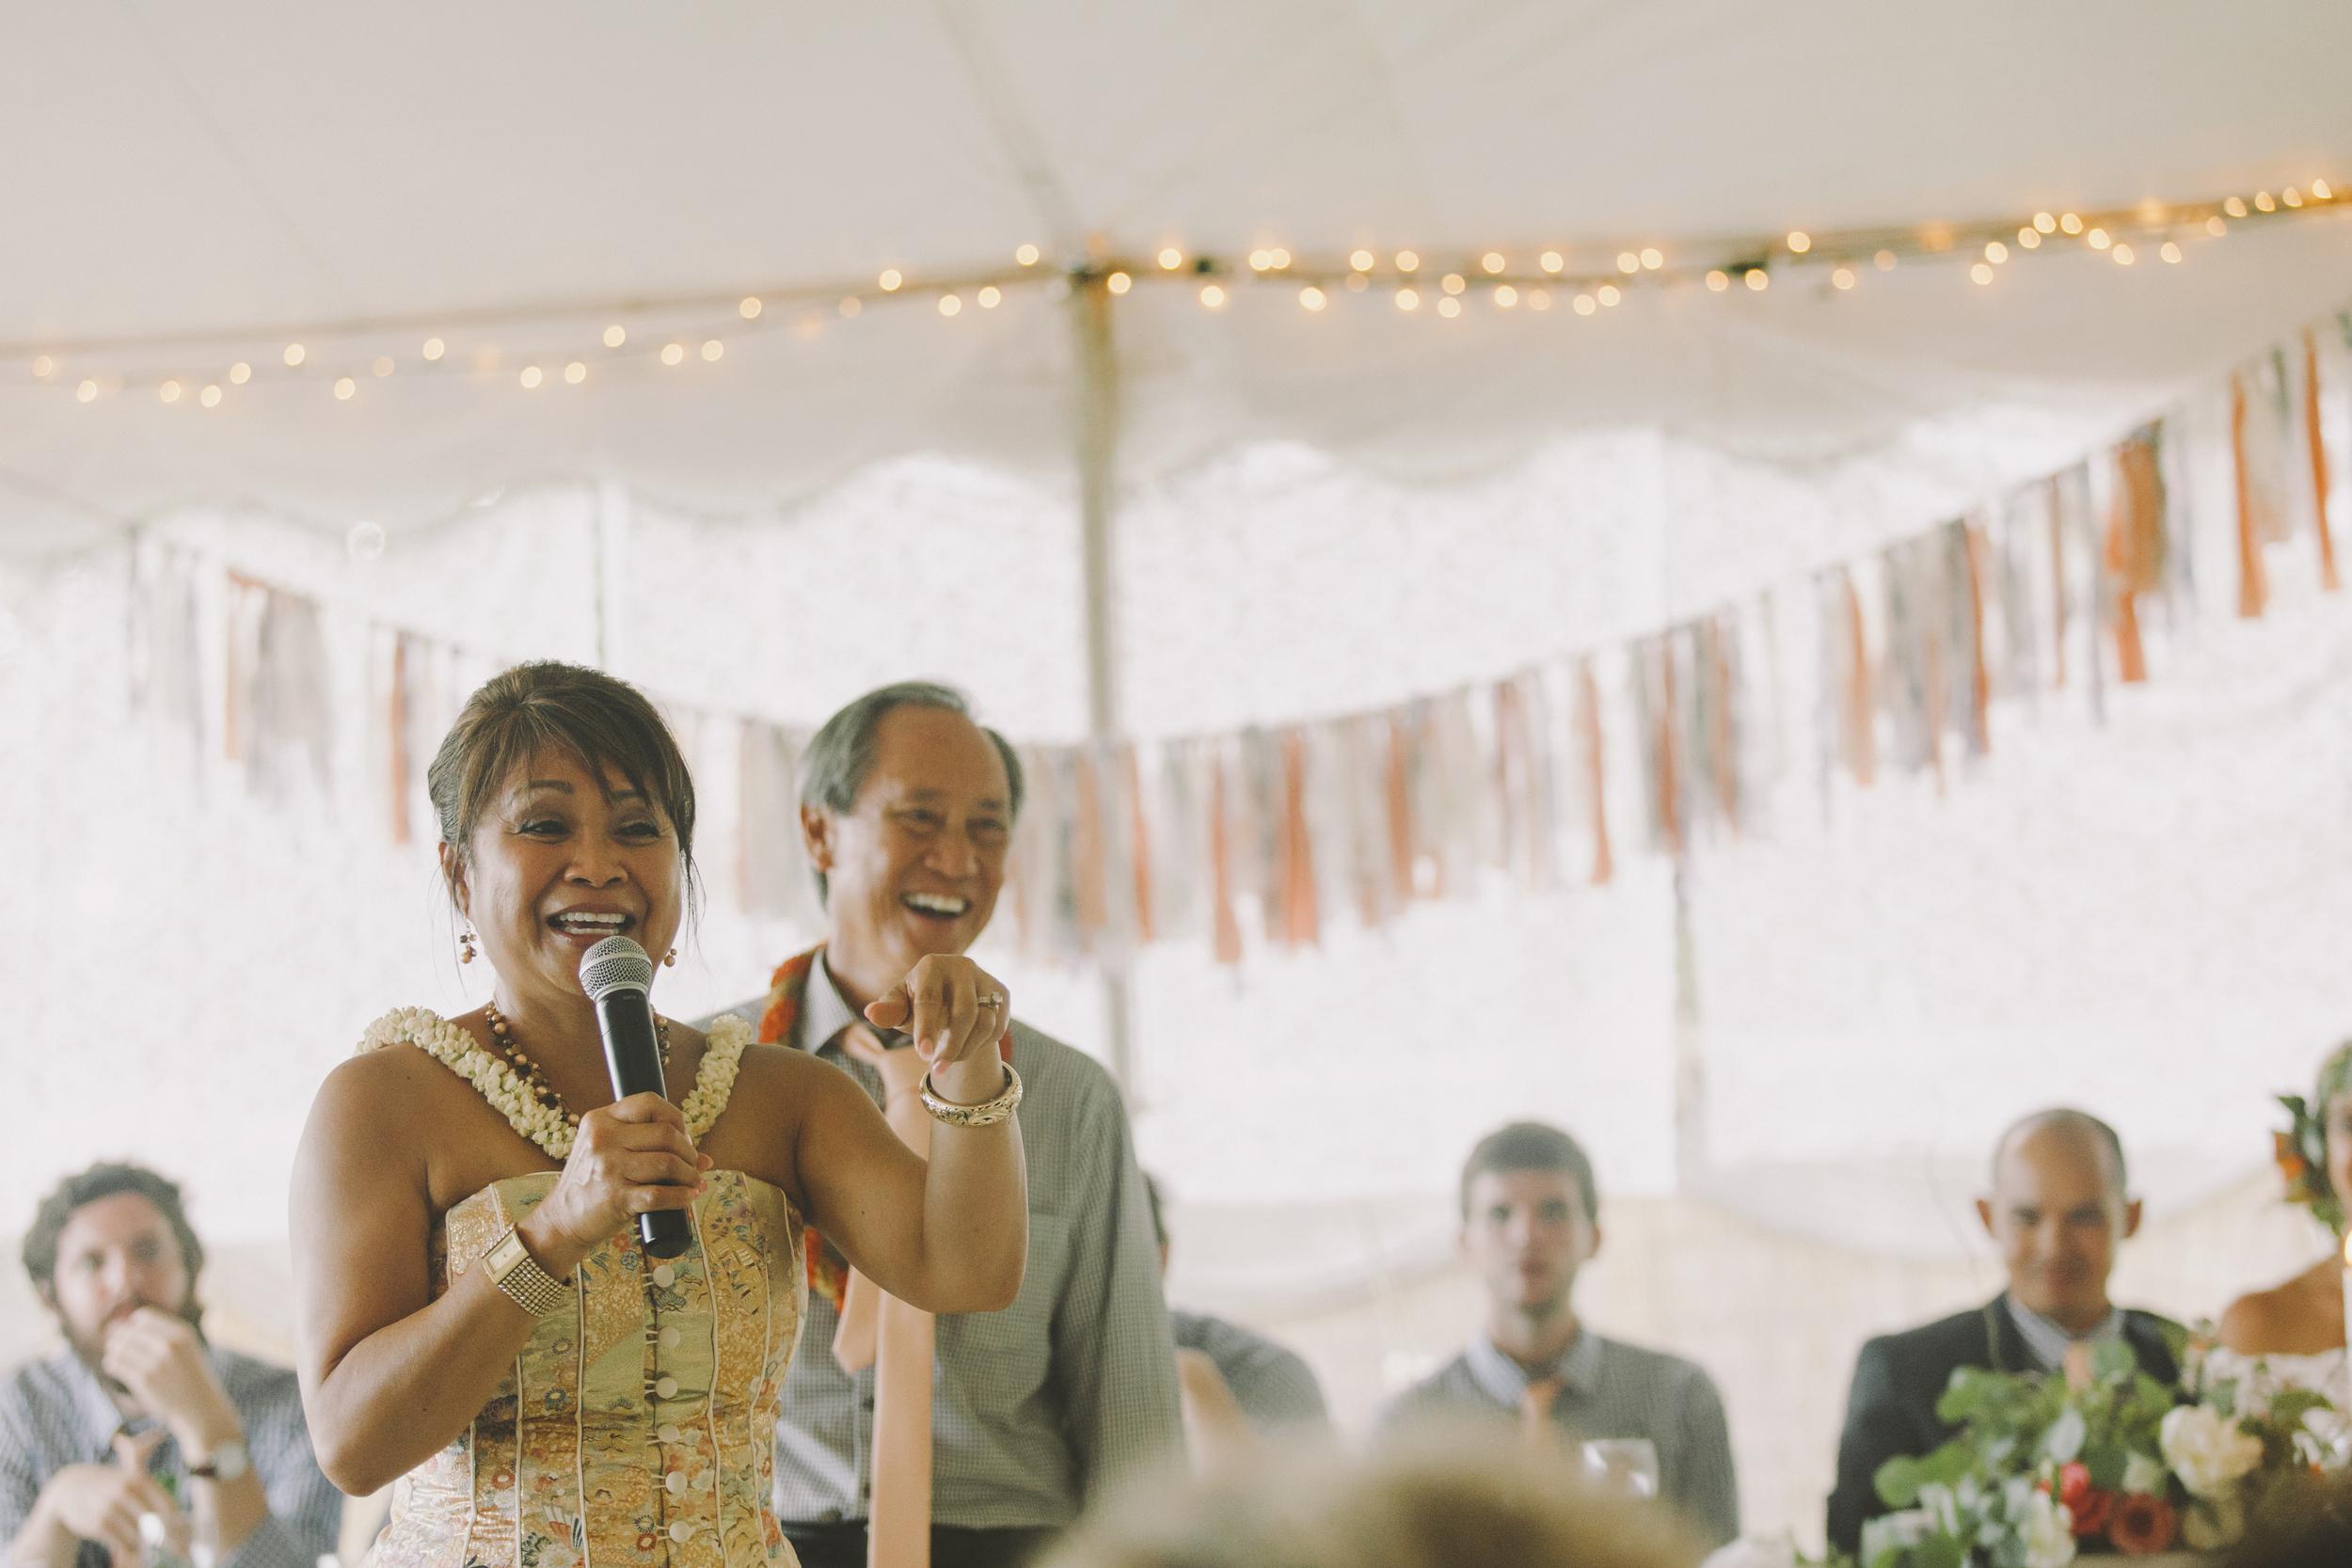 angie-diaz-photography-oahu-hawaii-wedding-tradewinds-ranch-107.jpg